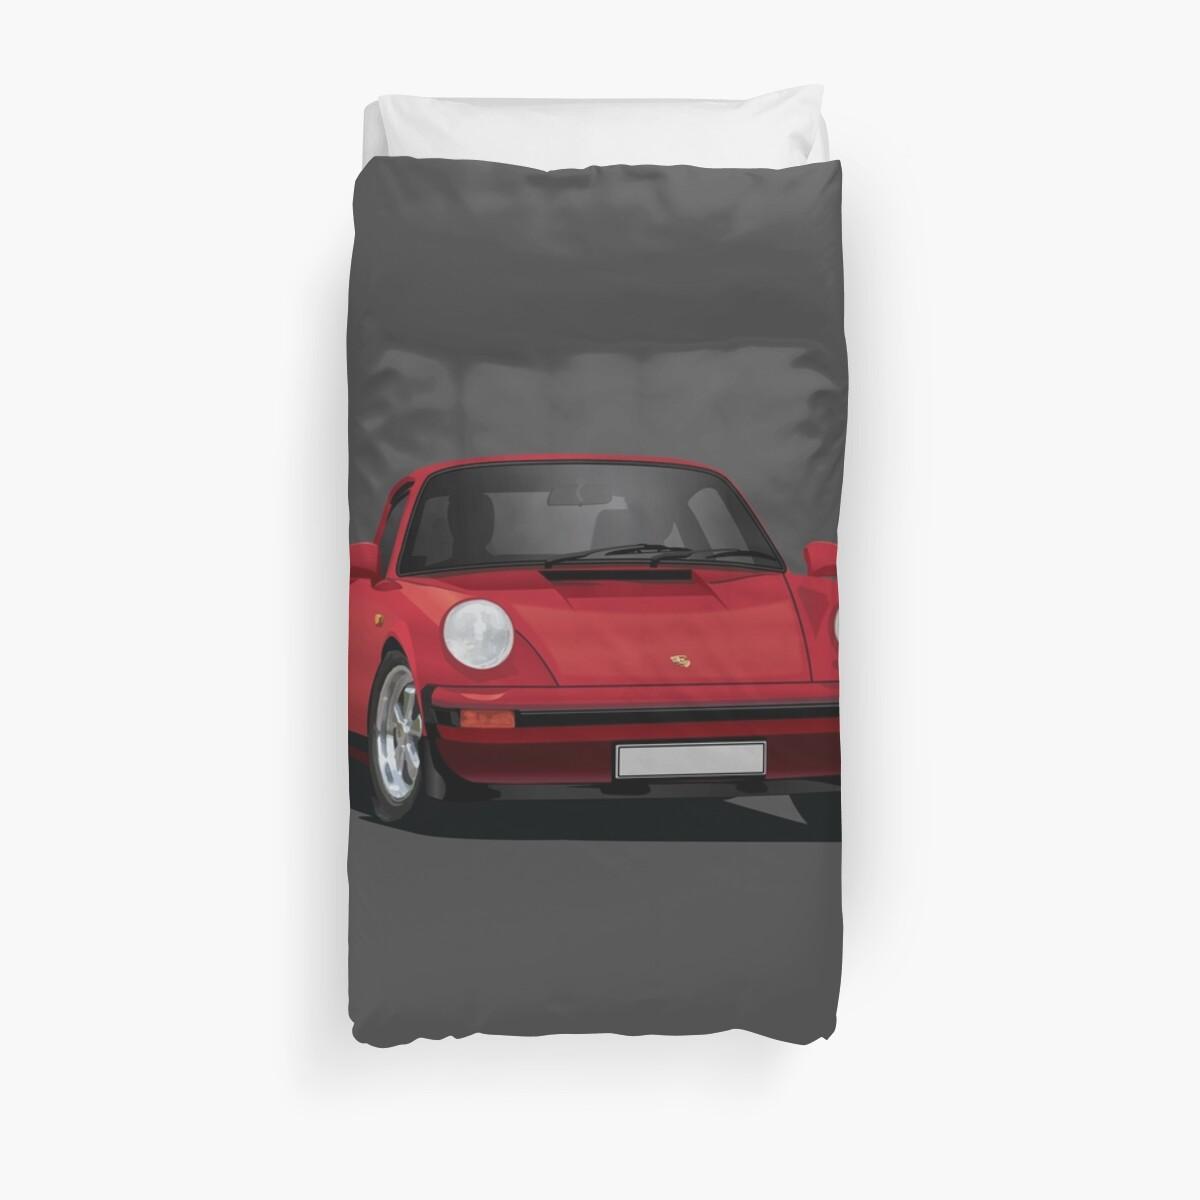 Porsche 911 Illustration Red Duvet Covers By Knappidesign Redbubble